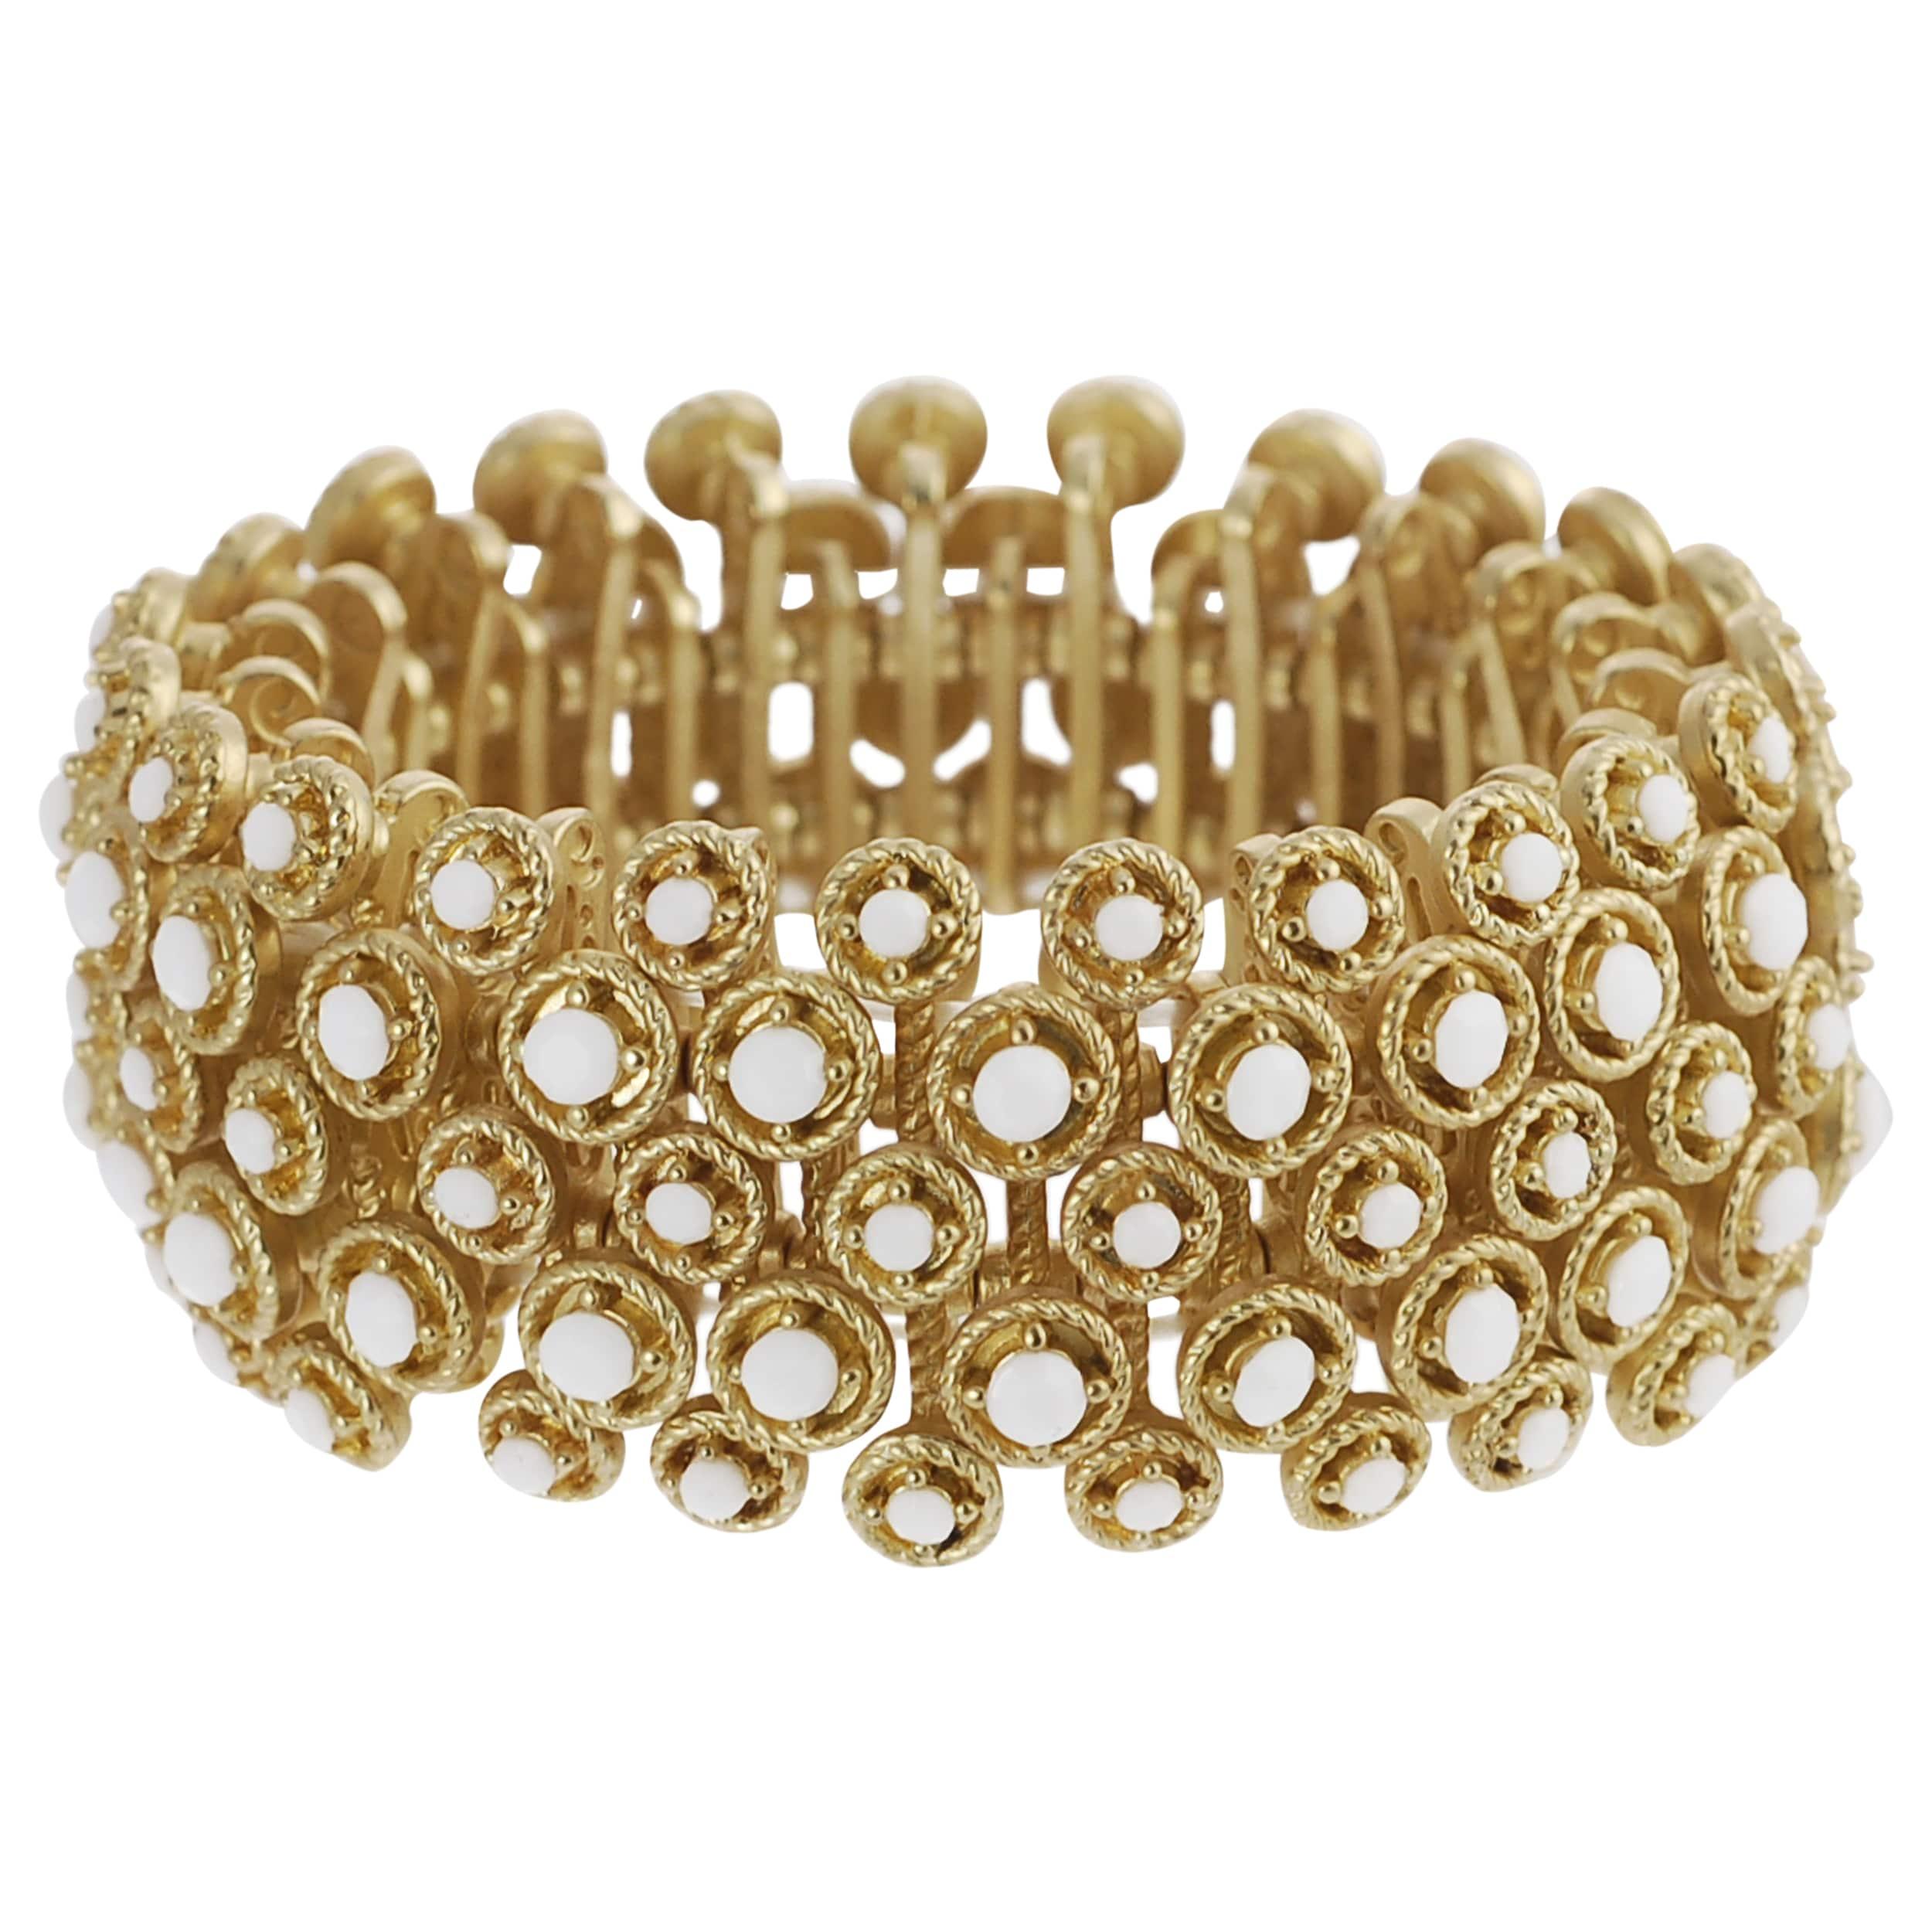 Journee Collection Goldtone Acrylic Bead Vintage Stretch Bracelet